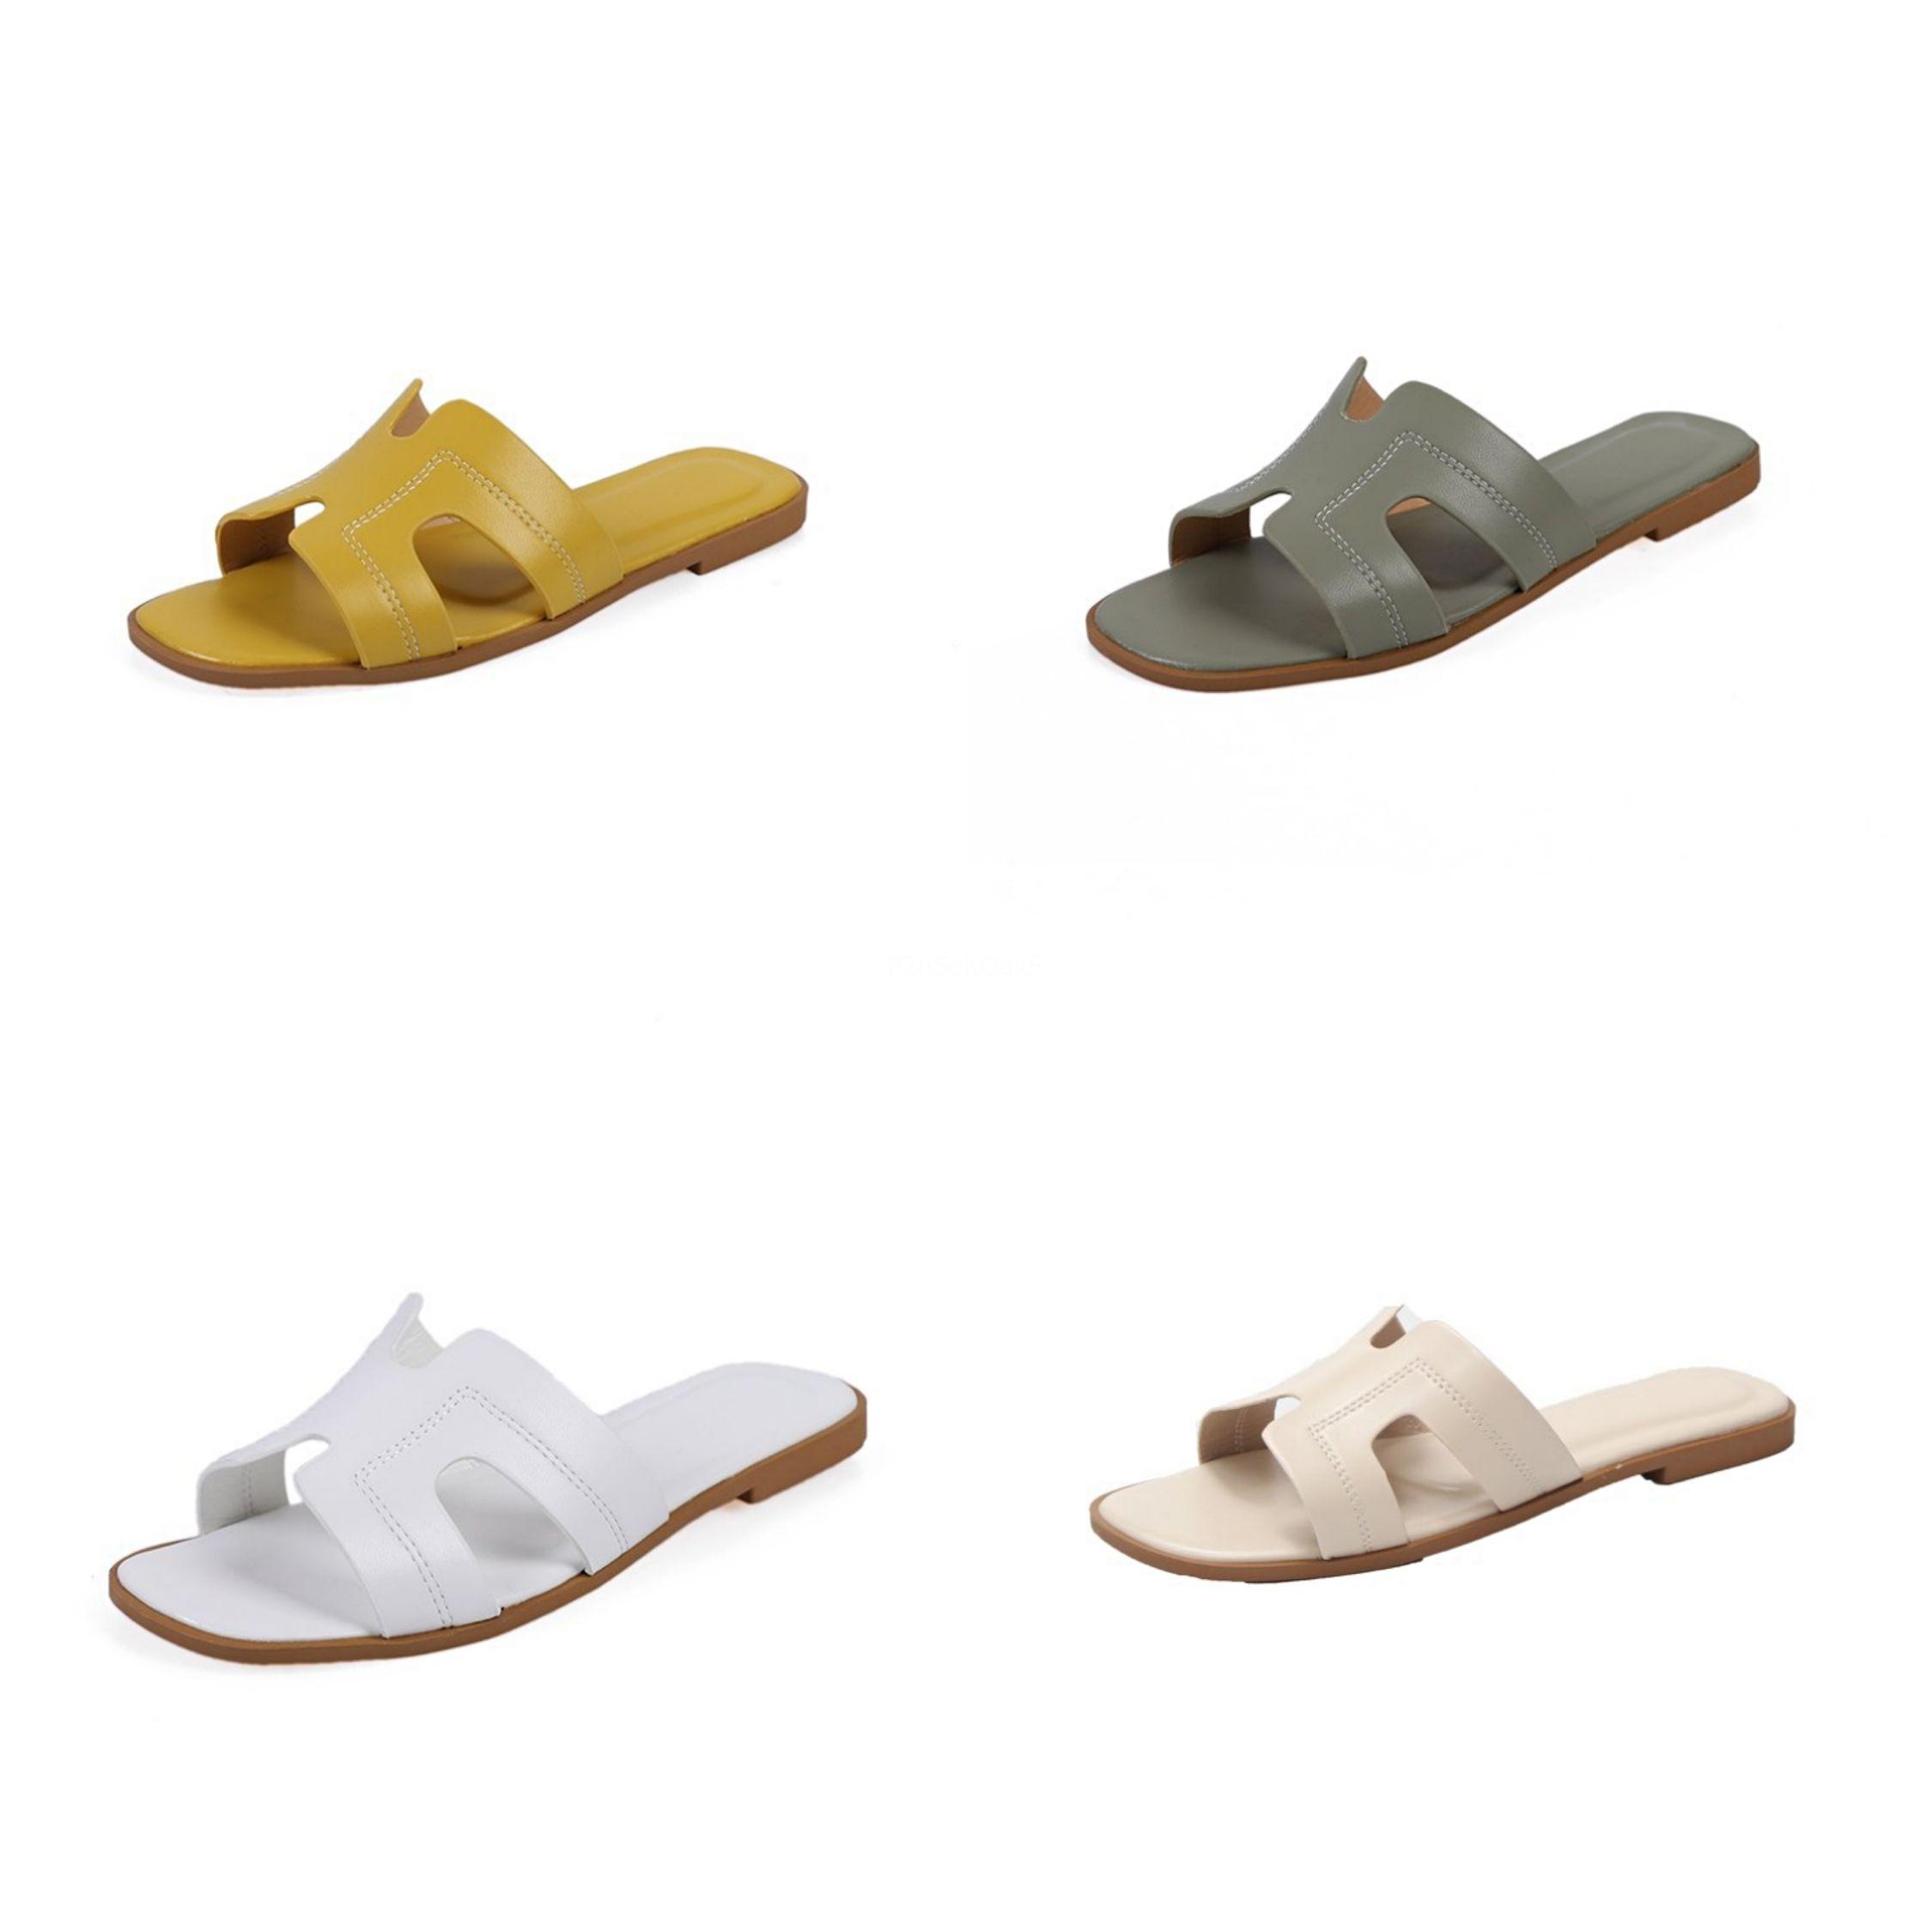 Uomini Pantofole di cuoio di lusso diapositive Calzature Classics Estate Maschio Beach morbide pantofole fondo scarpe traspiranti H Flats # 785